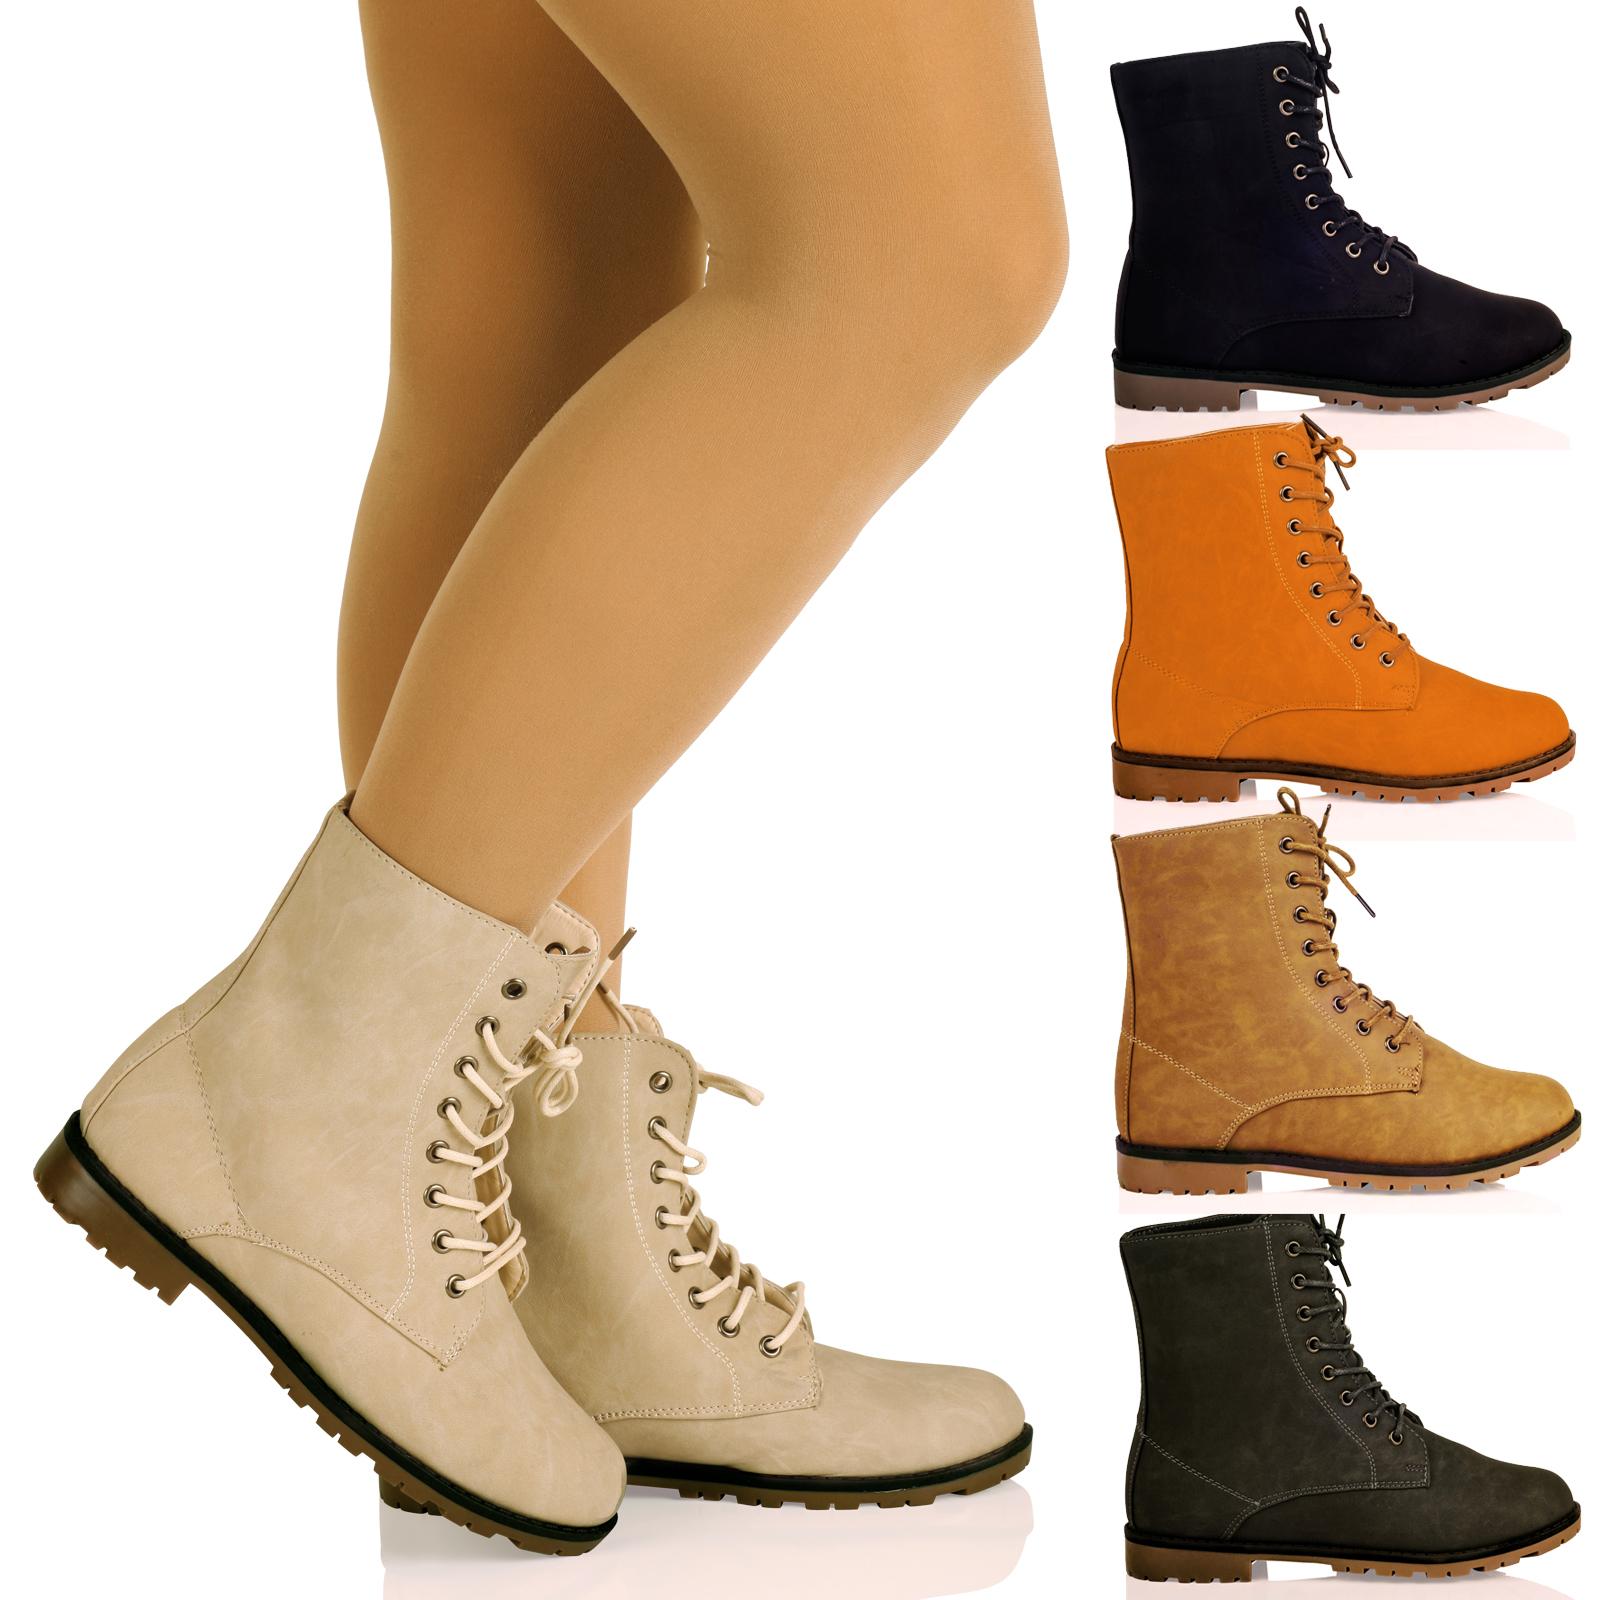 Stylish flat boots for women